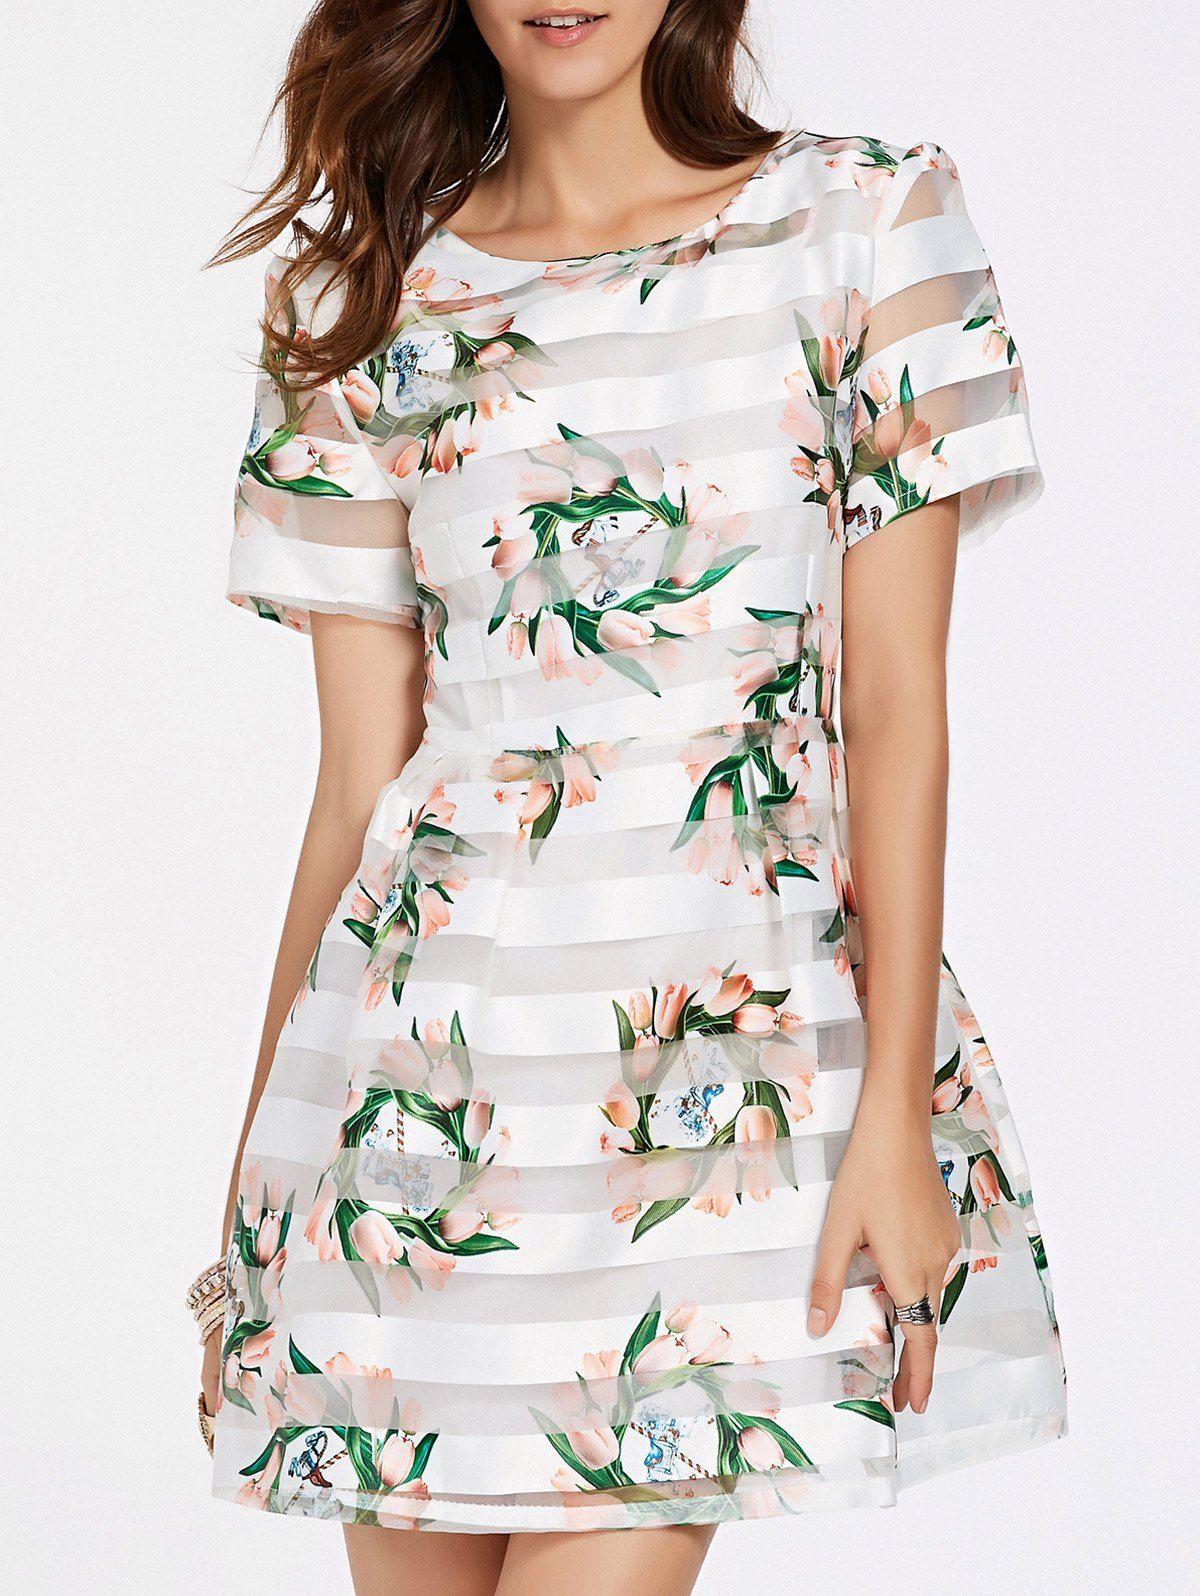 566c2b79a8e8 Vintage Jewel Neck Floral Print Striped Organza Dress For Women |  NastyDress.com